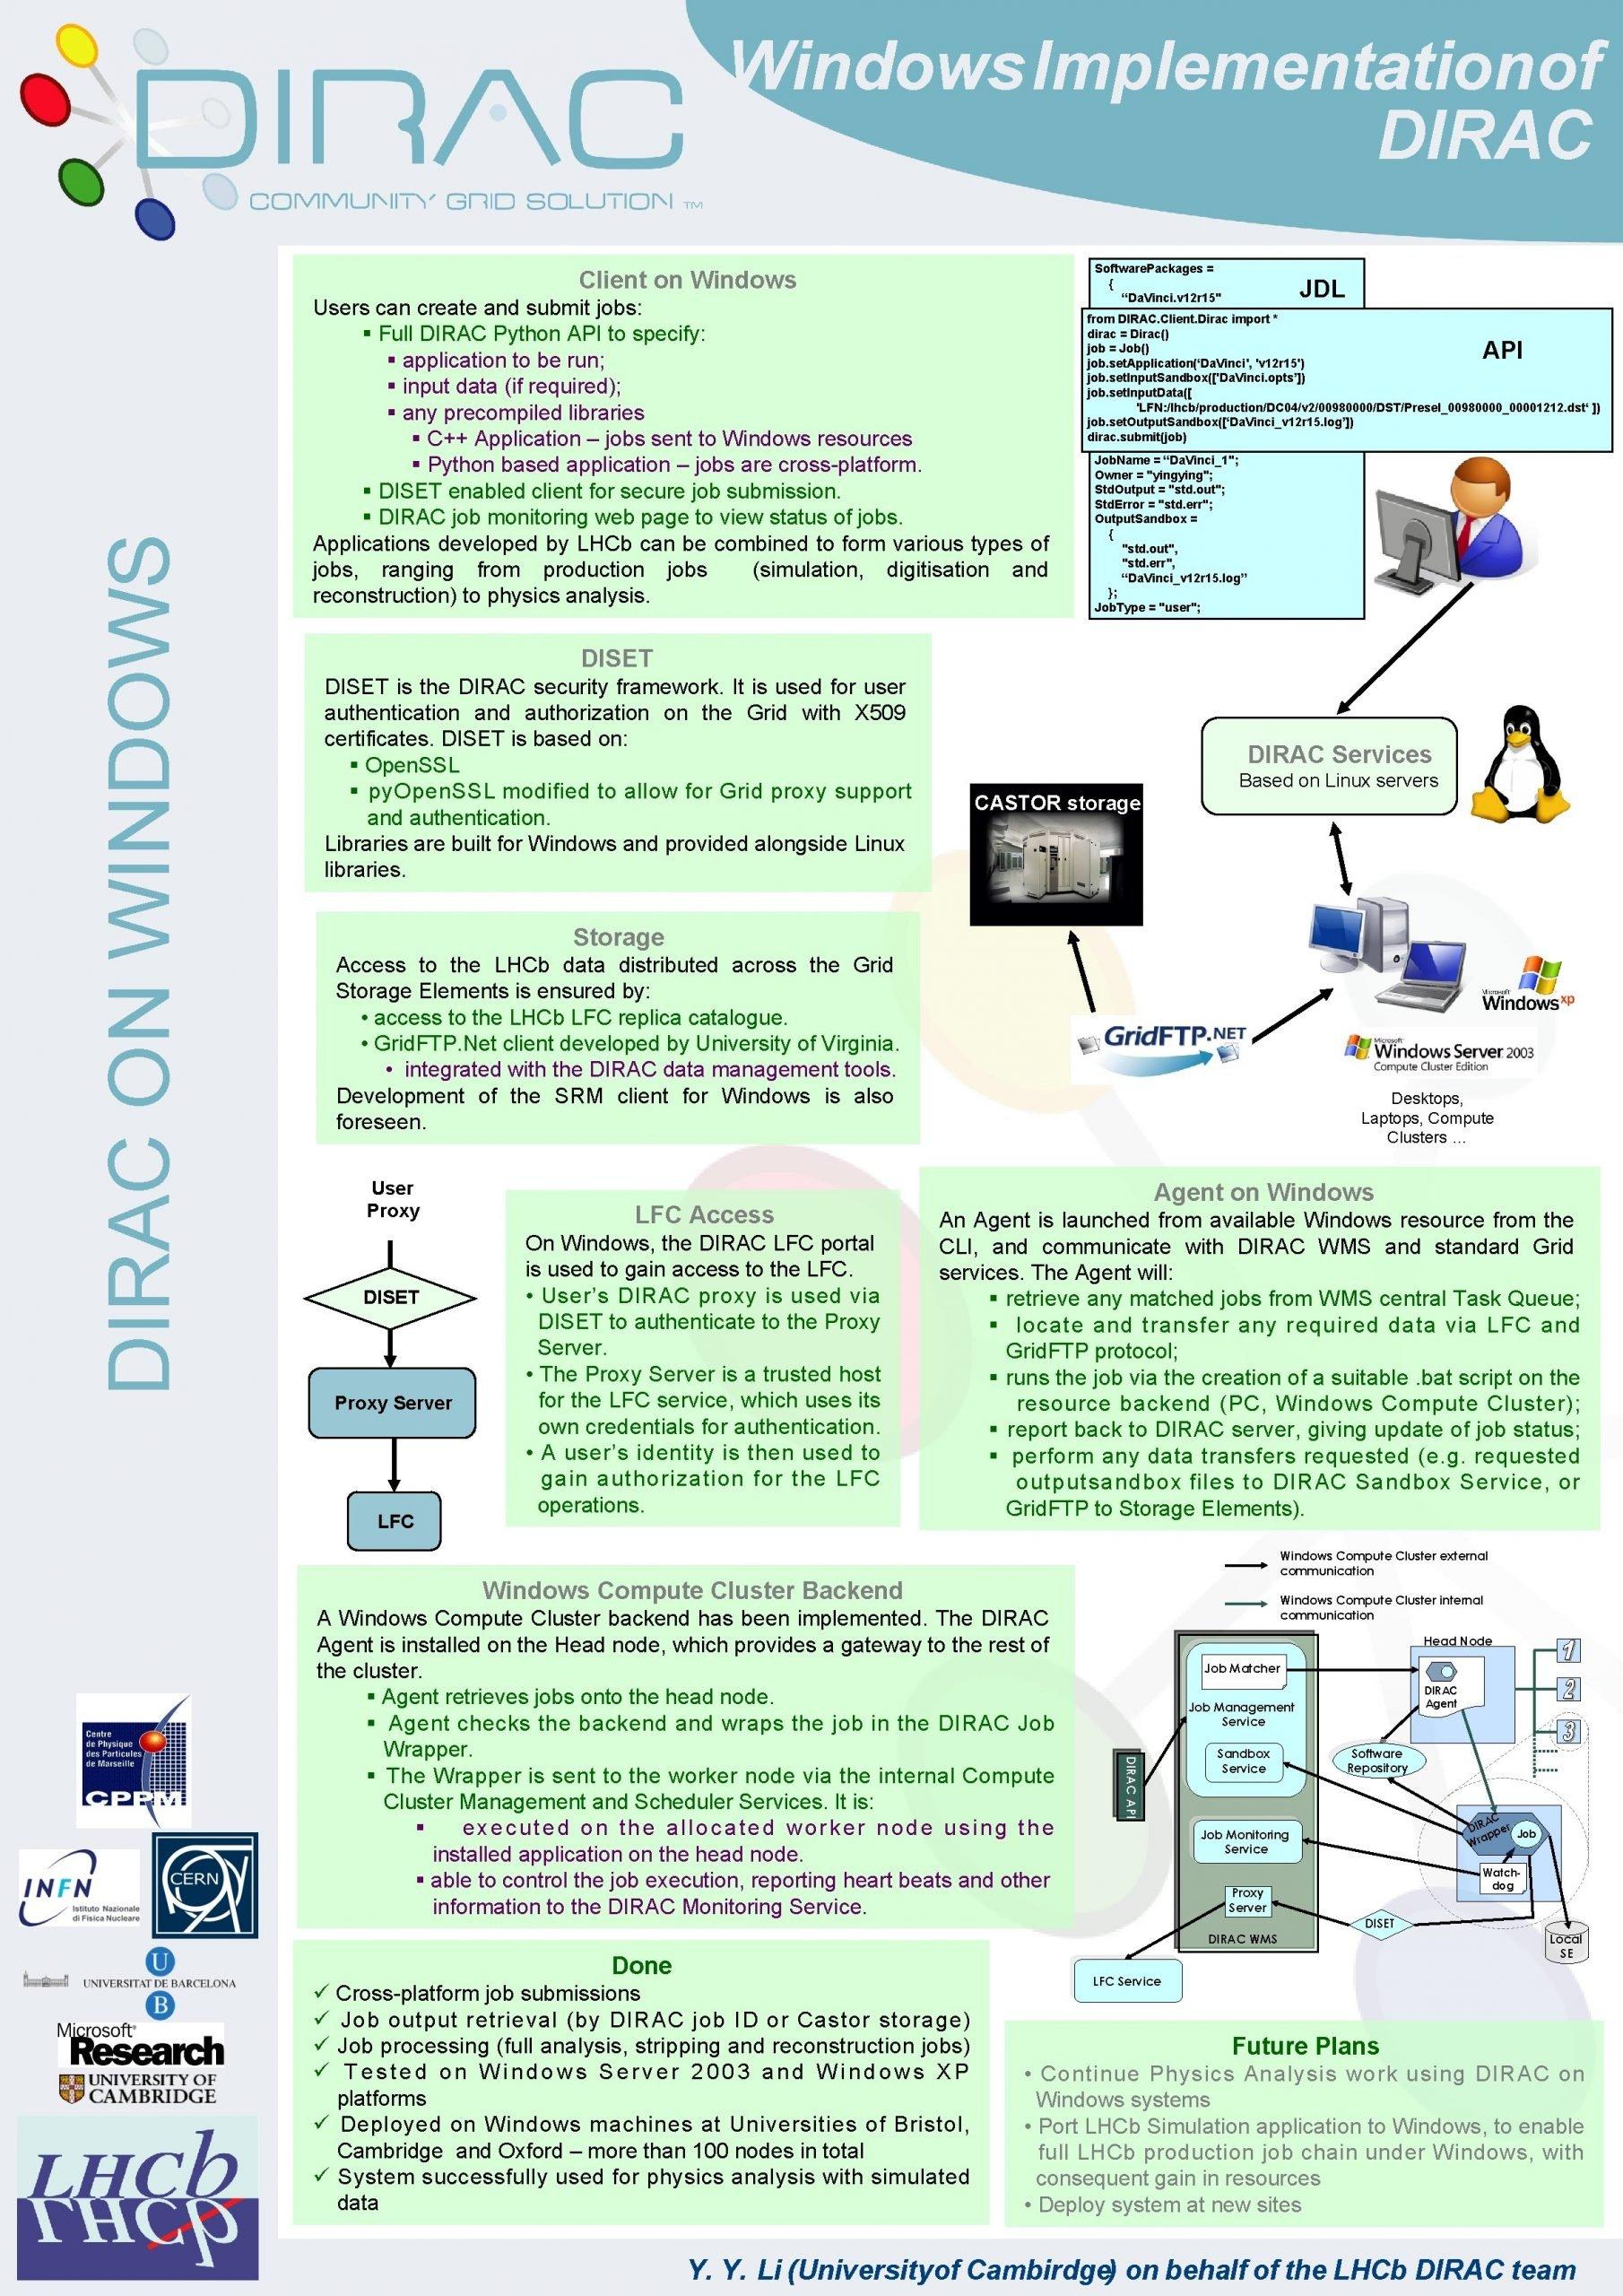 Windows Implementationof DIRAC ON WINDOWS Client on Windows